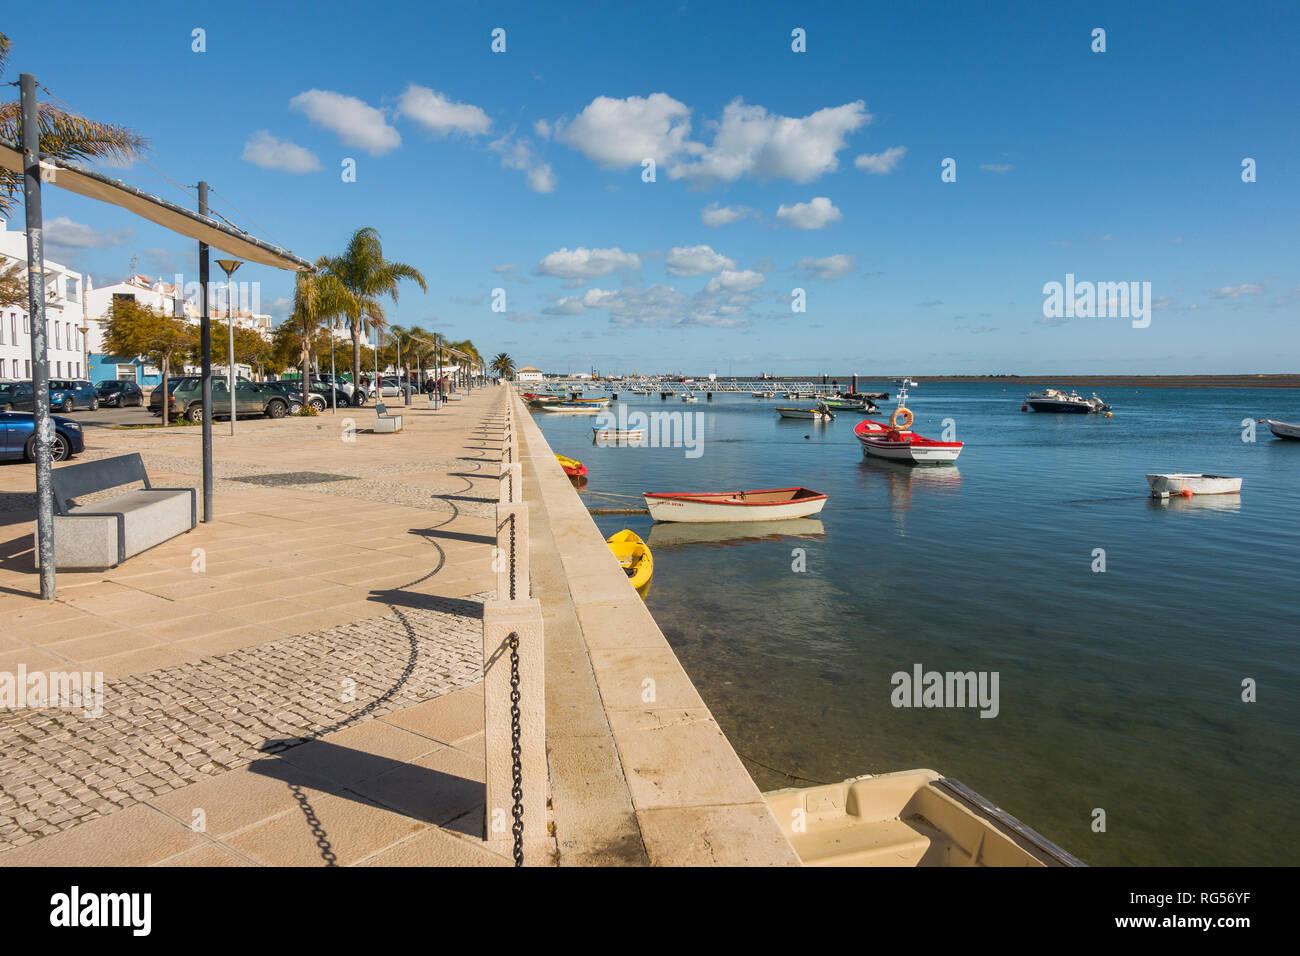 Traditional Portuguese fishing village, Santa Luzia, Algarve, Portugal, Europe. Stock Photo